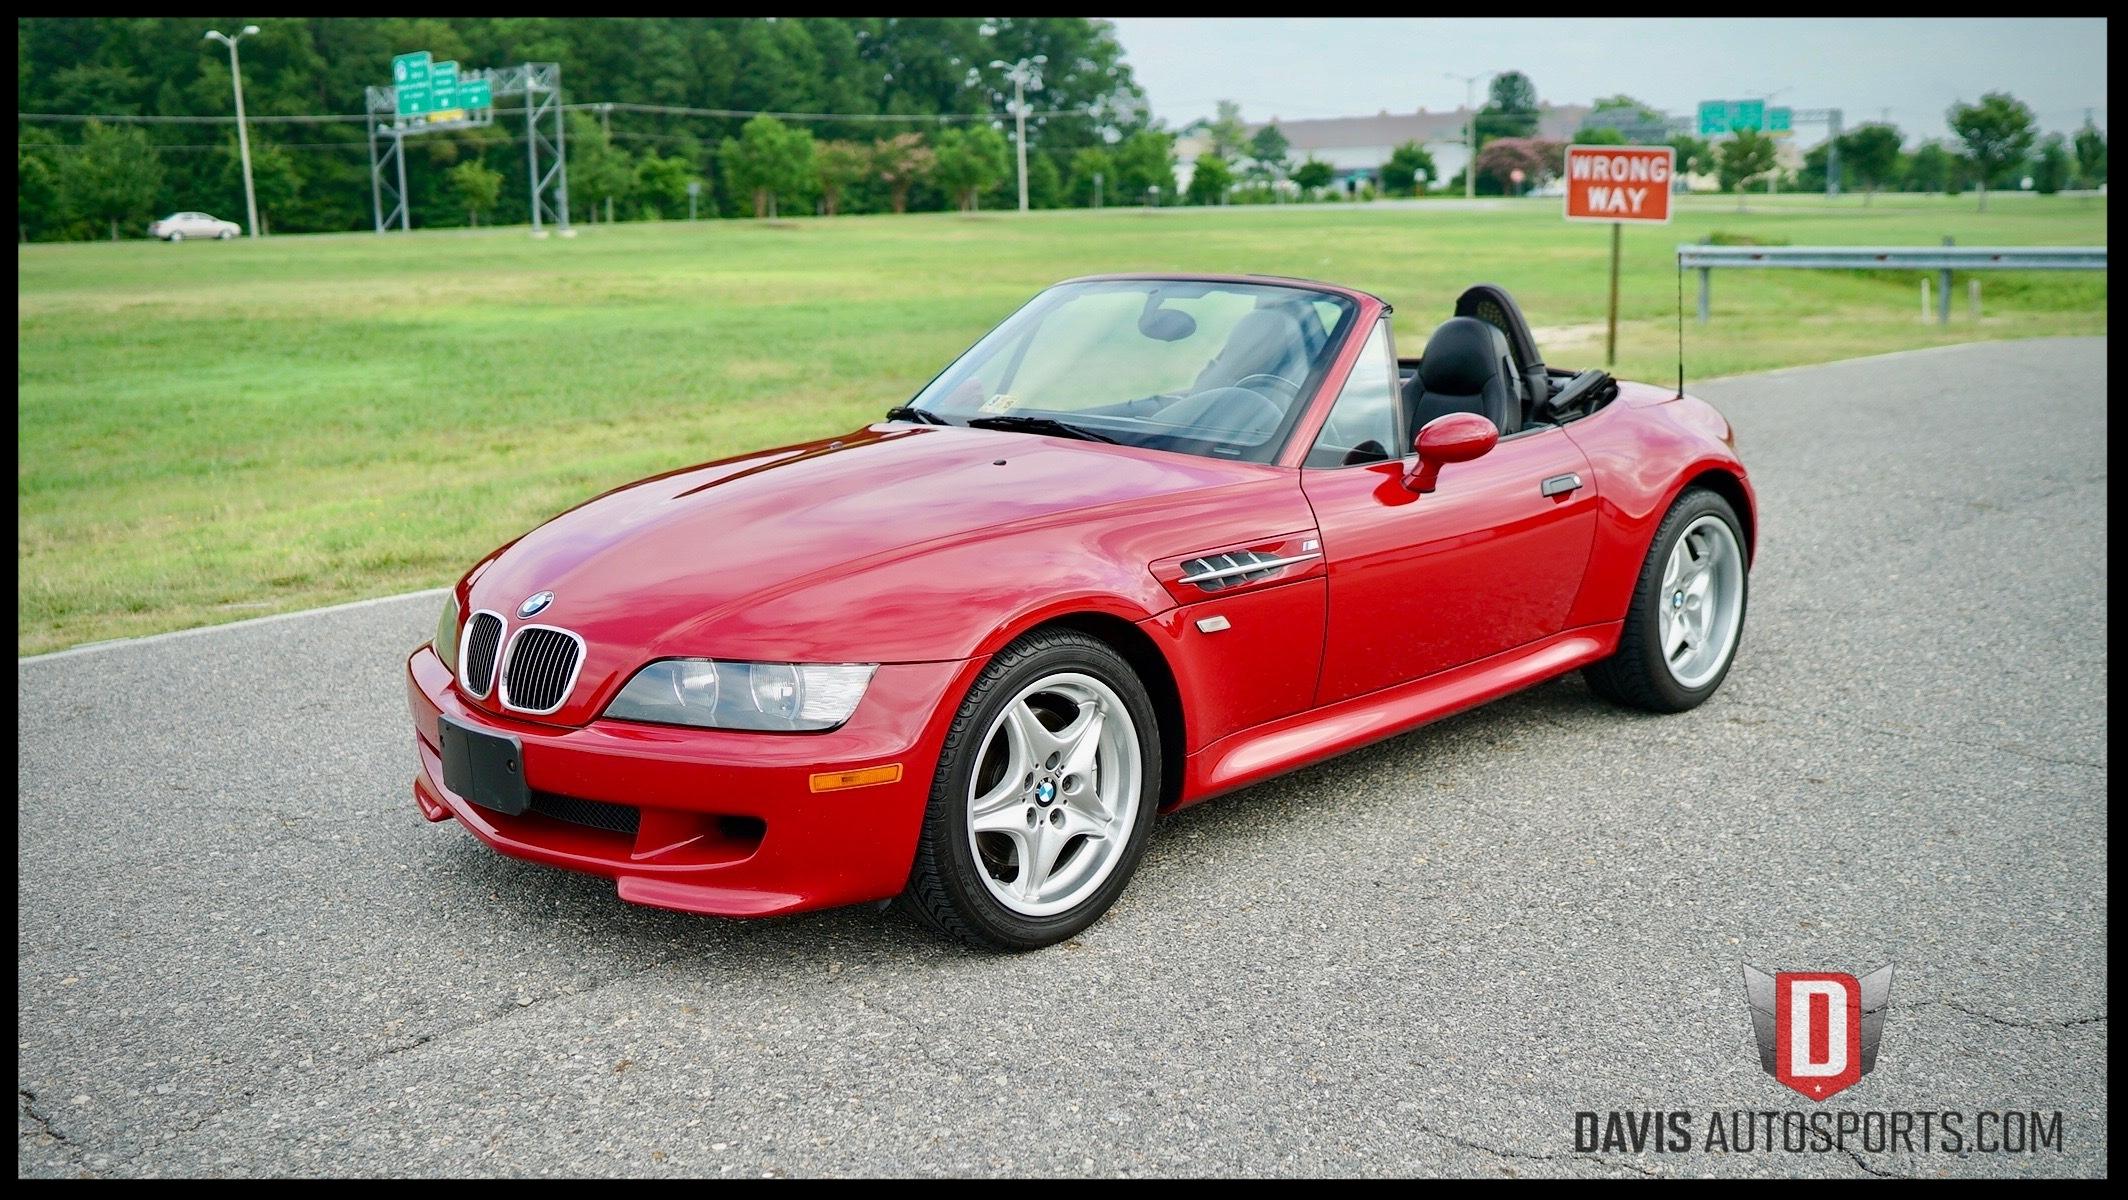 2000 BMW Z3 M Roadster.jpg